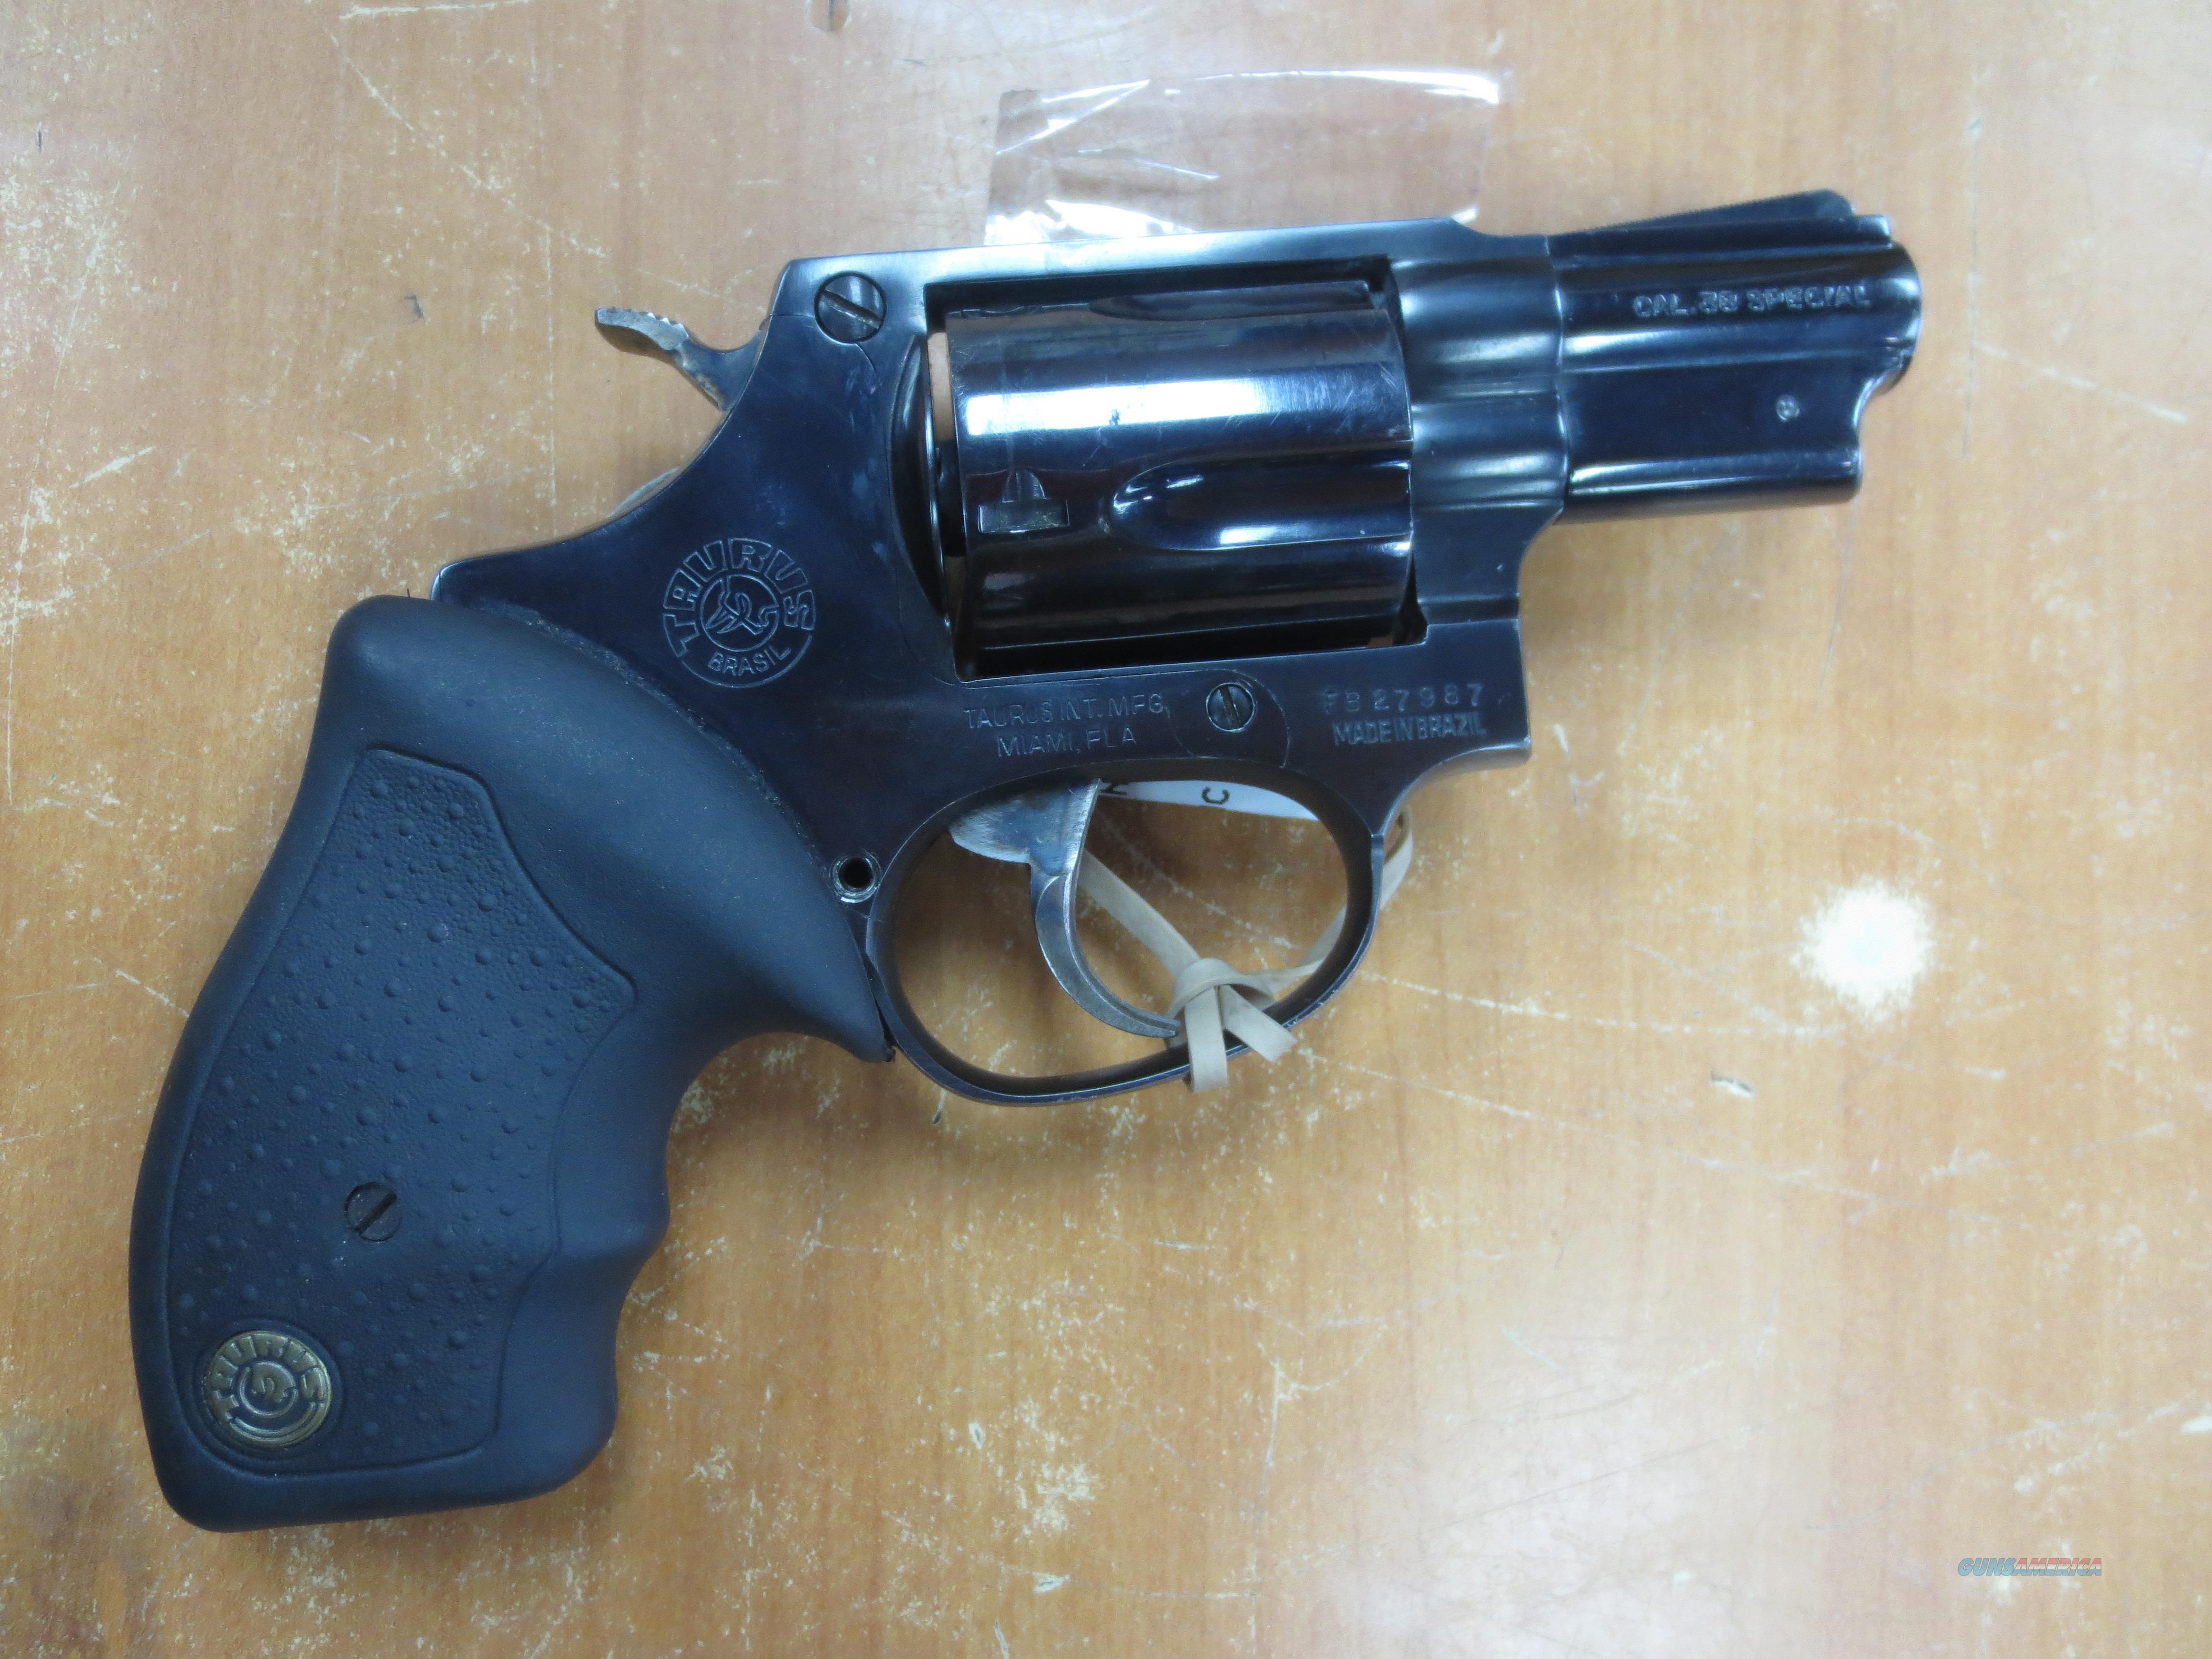 Taurus model 85 Snub Nose 5 Shot .38 Special CA ok!  Guns > Pistols > Taurus Pistols > Revolvers